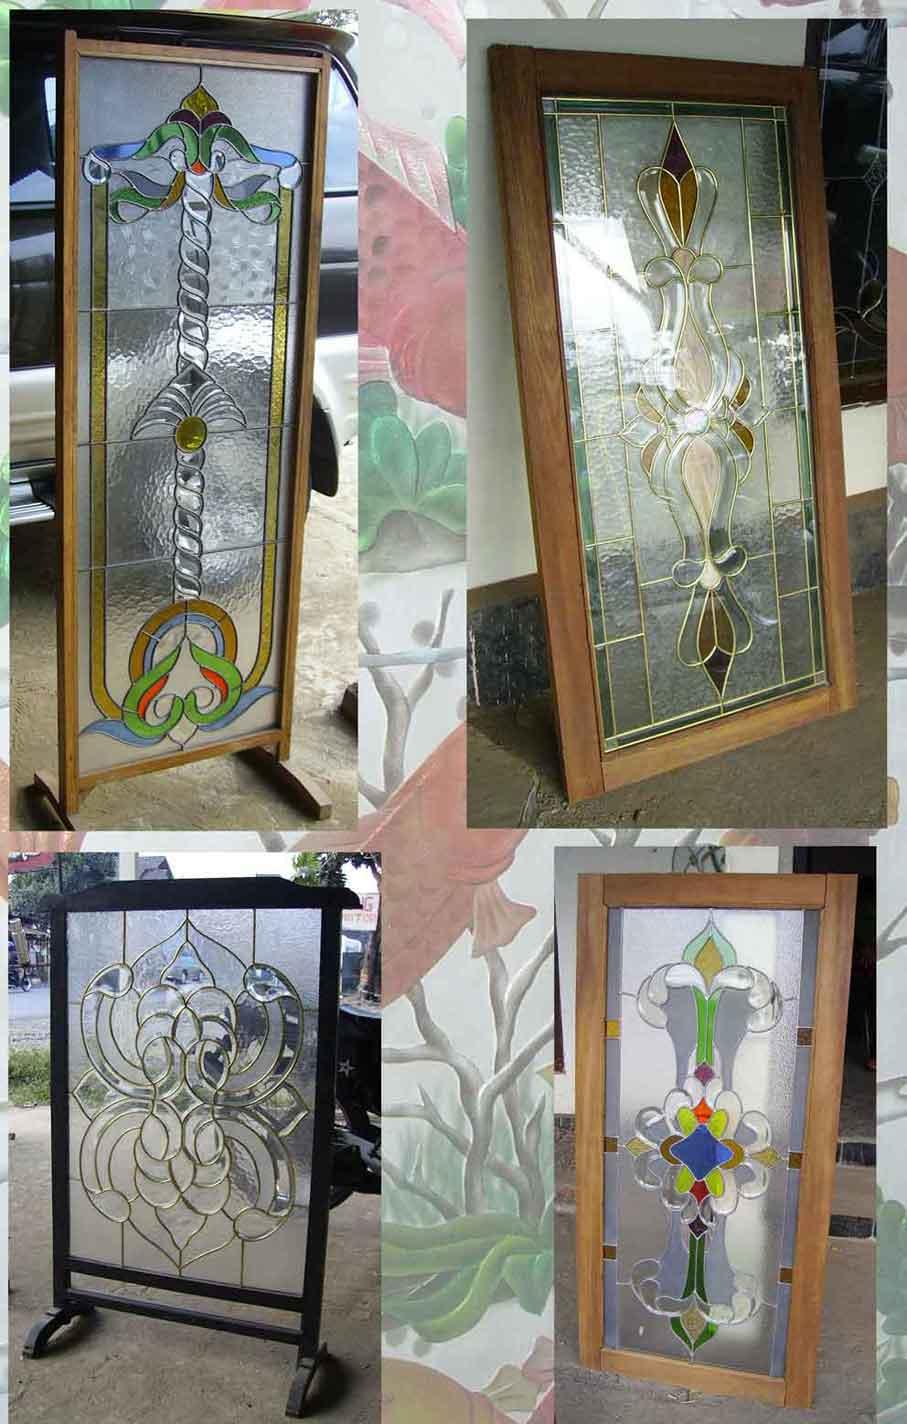 Wooden Door With Stained Glass (Деревянная дверь с витражом)